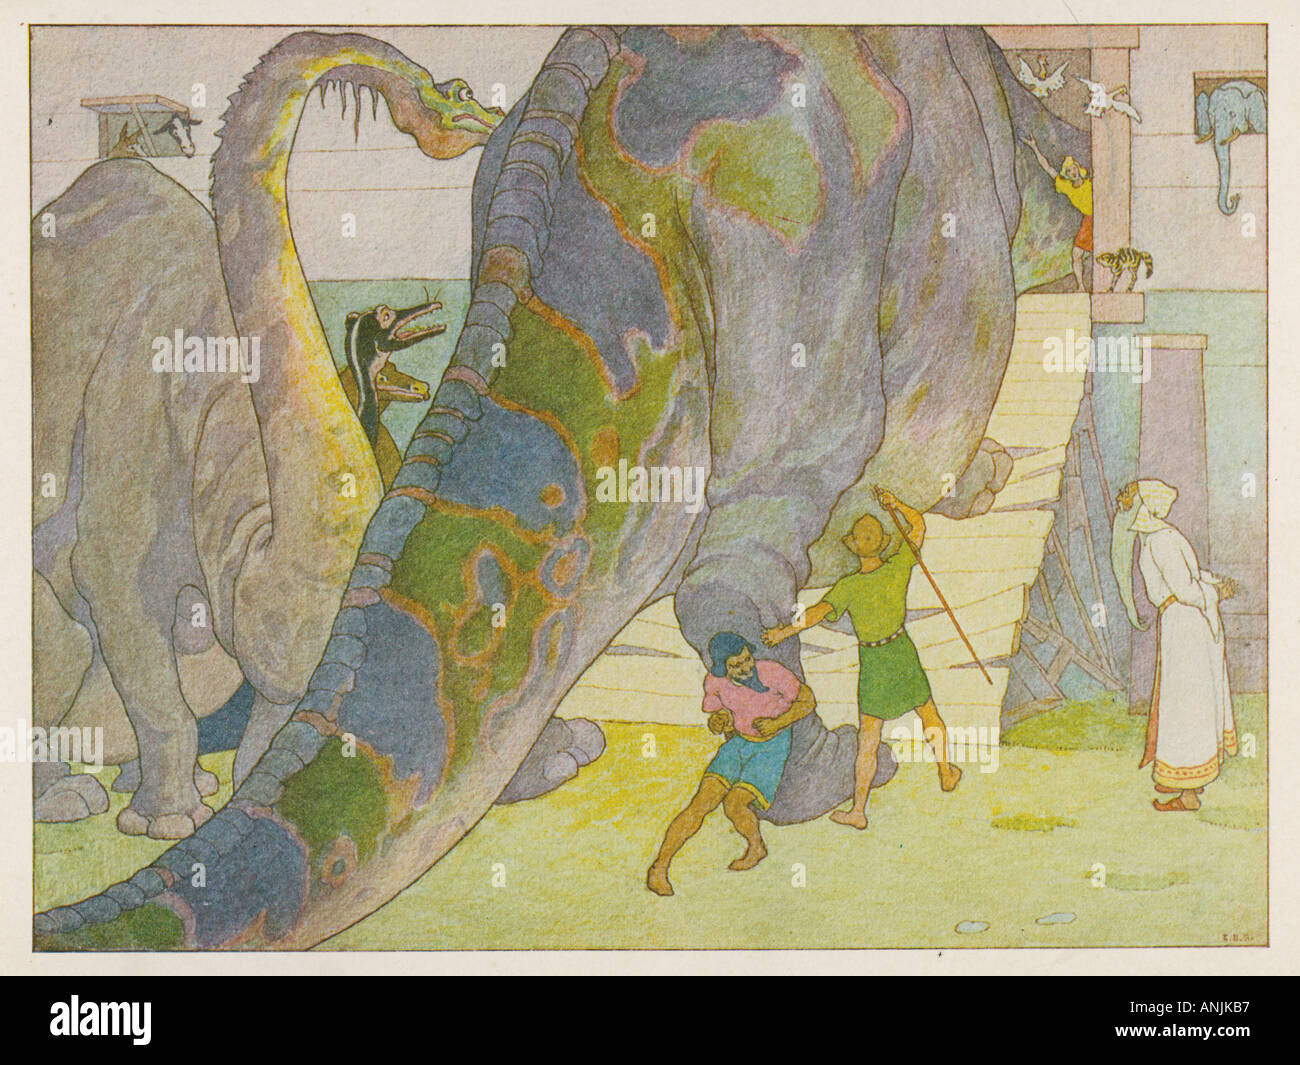 Dinosaurs Noahs Ark - Stock Image